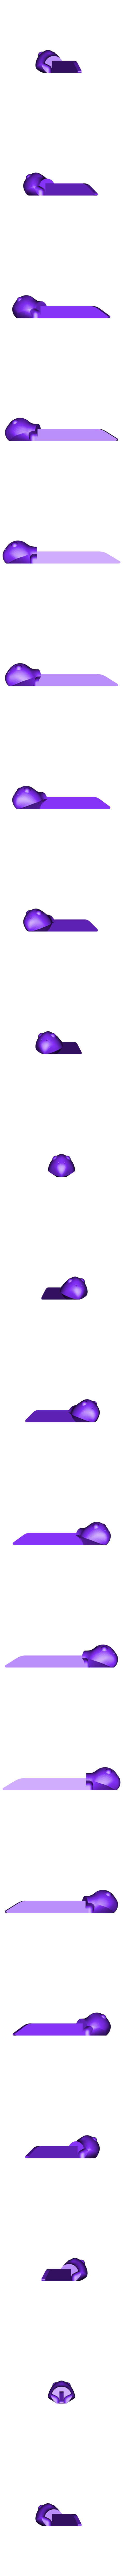 Head.STL Download free STL file Squishy Turtle • 3D print template, jakejake